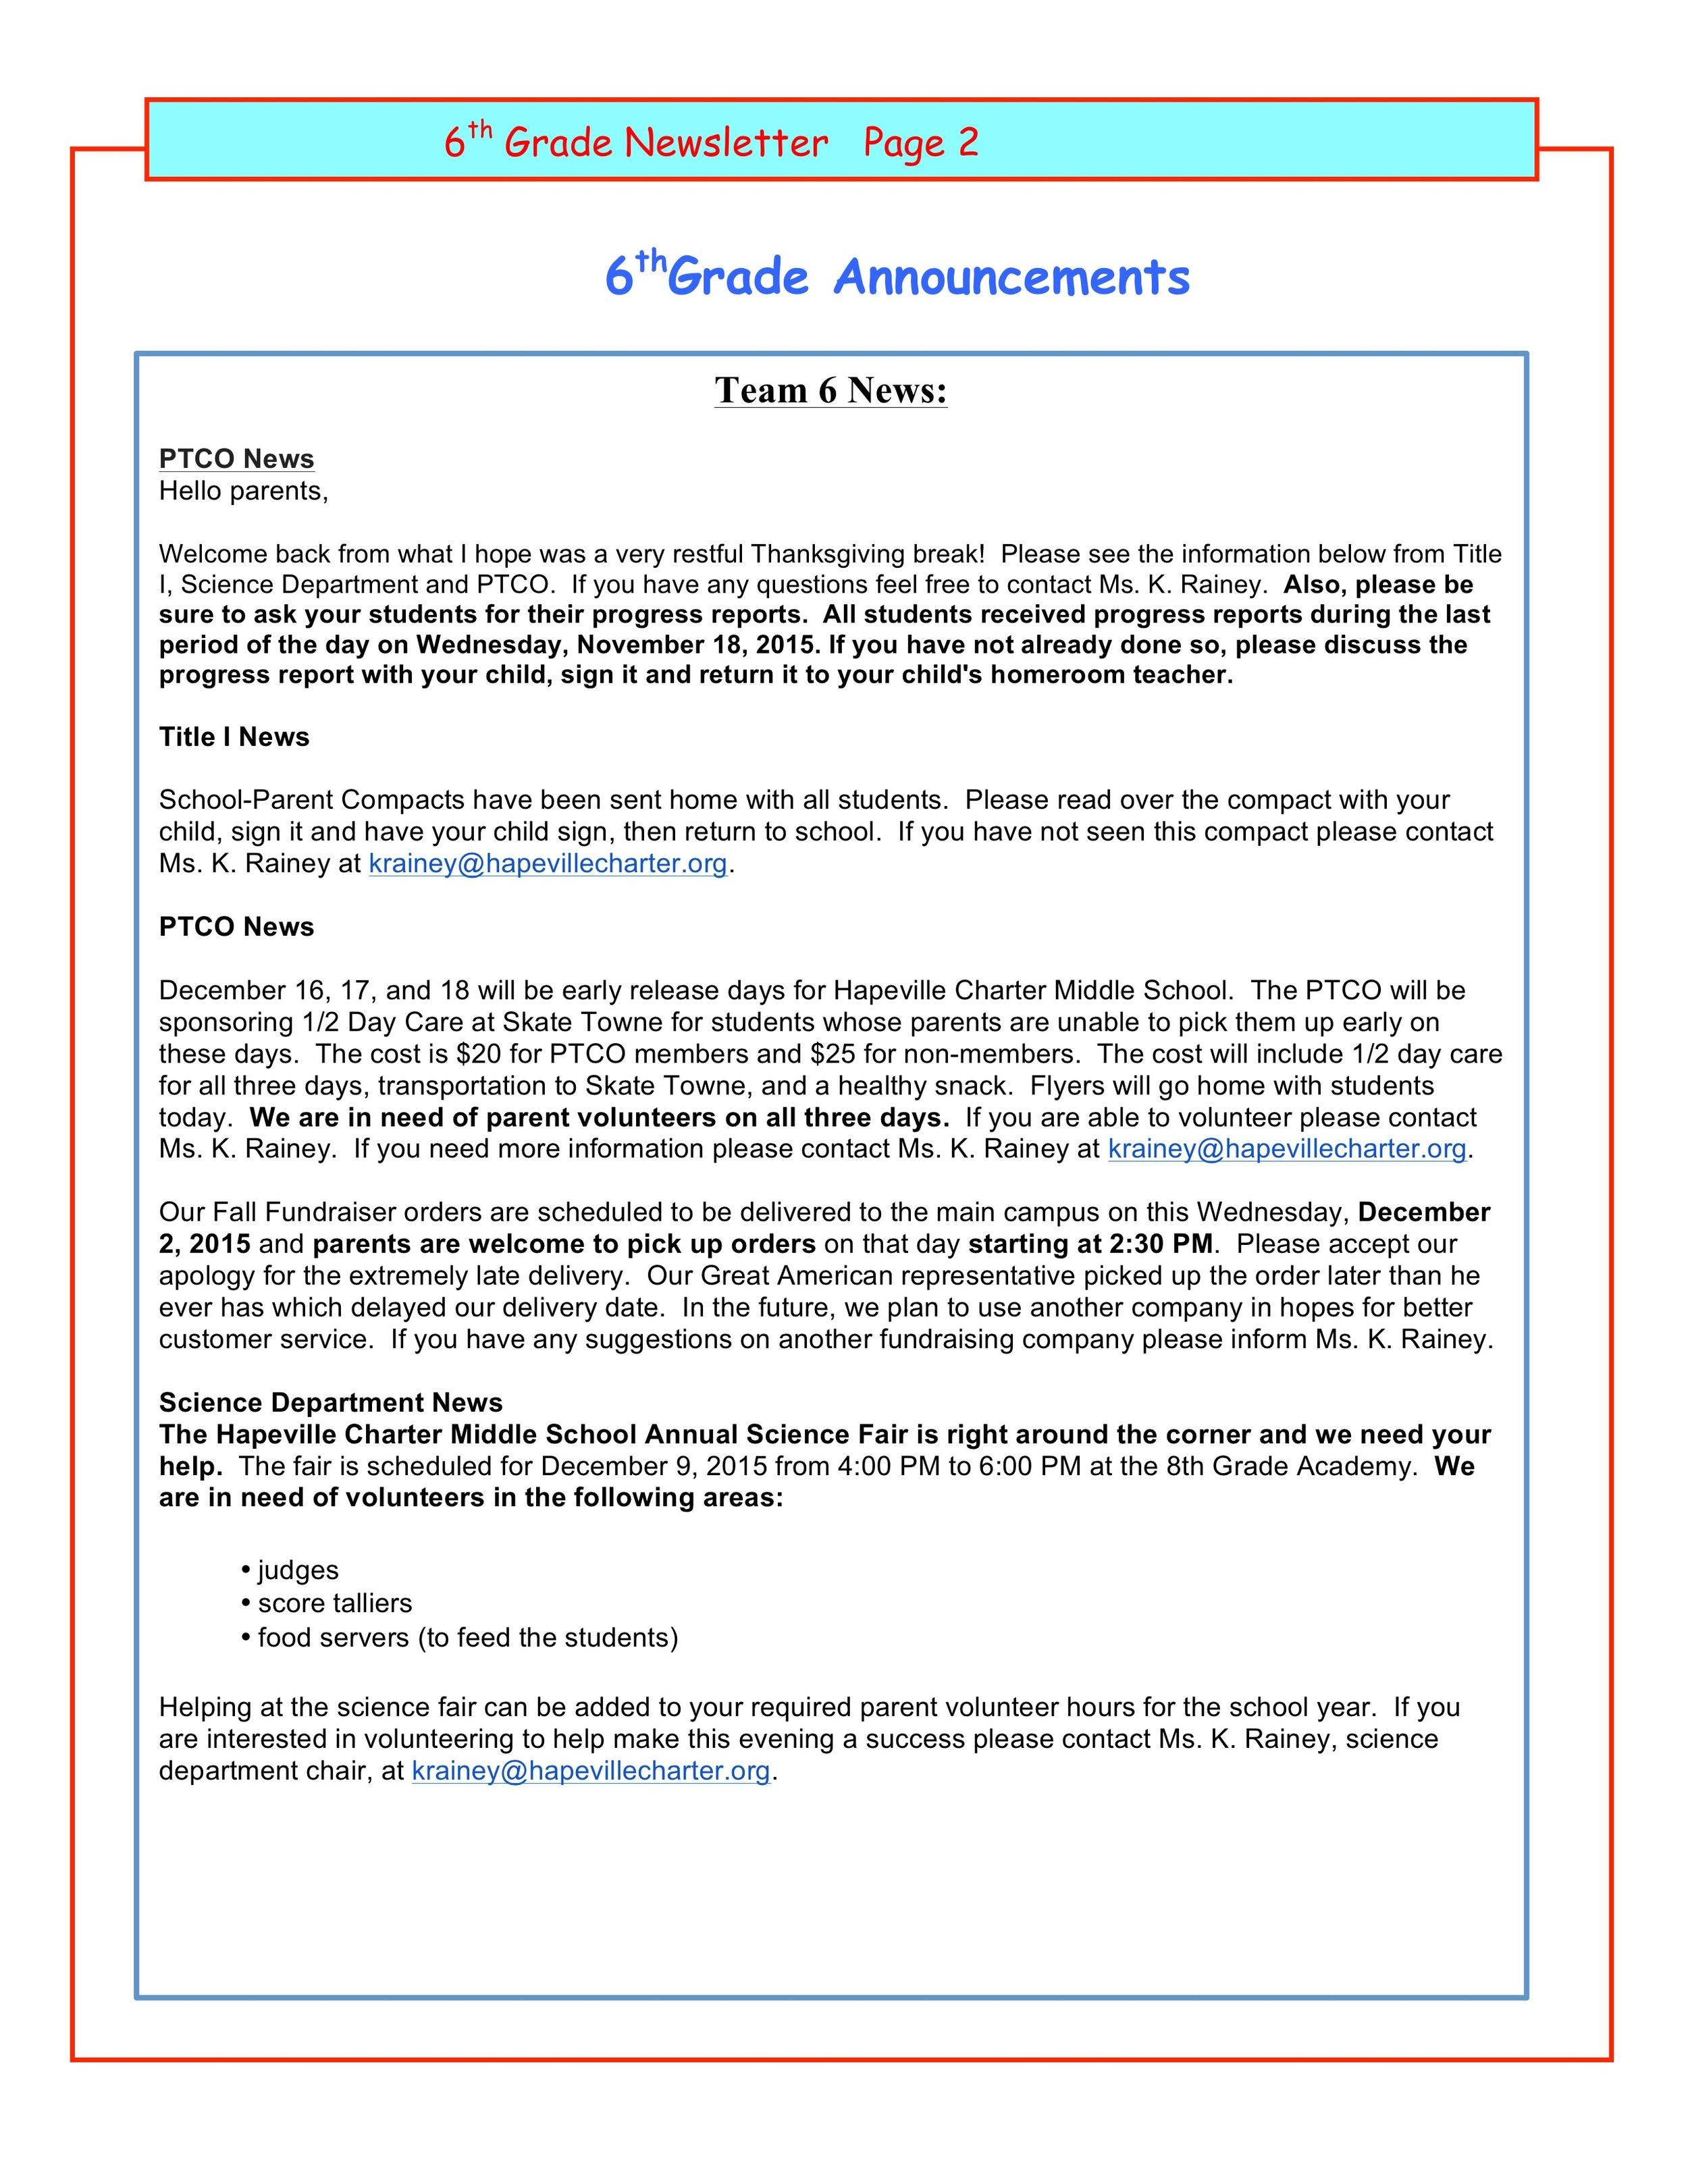 Newsletter Image6th grade dec 1 2015 2.jpeg